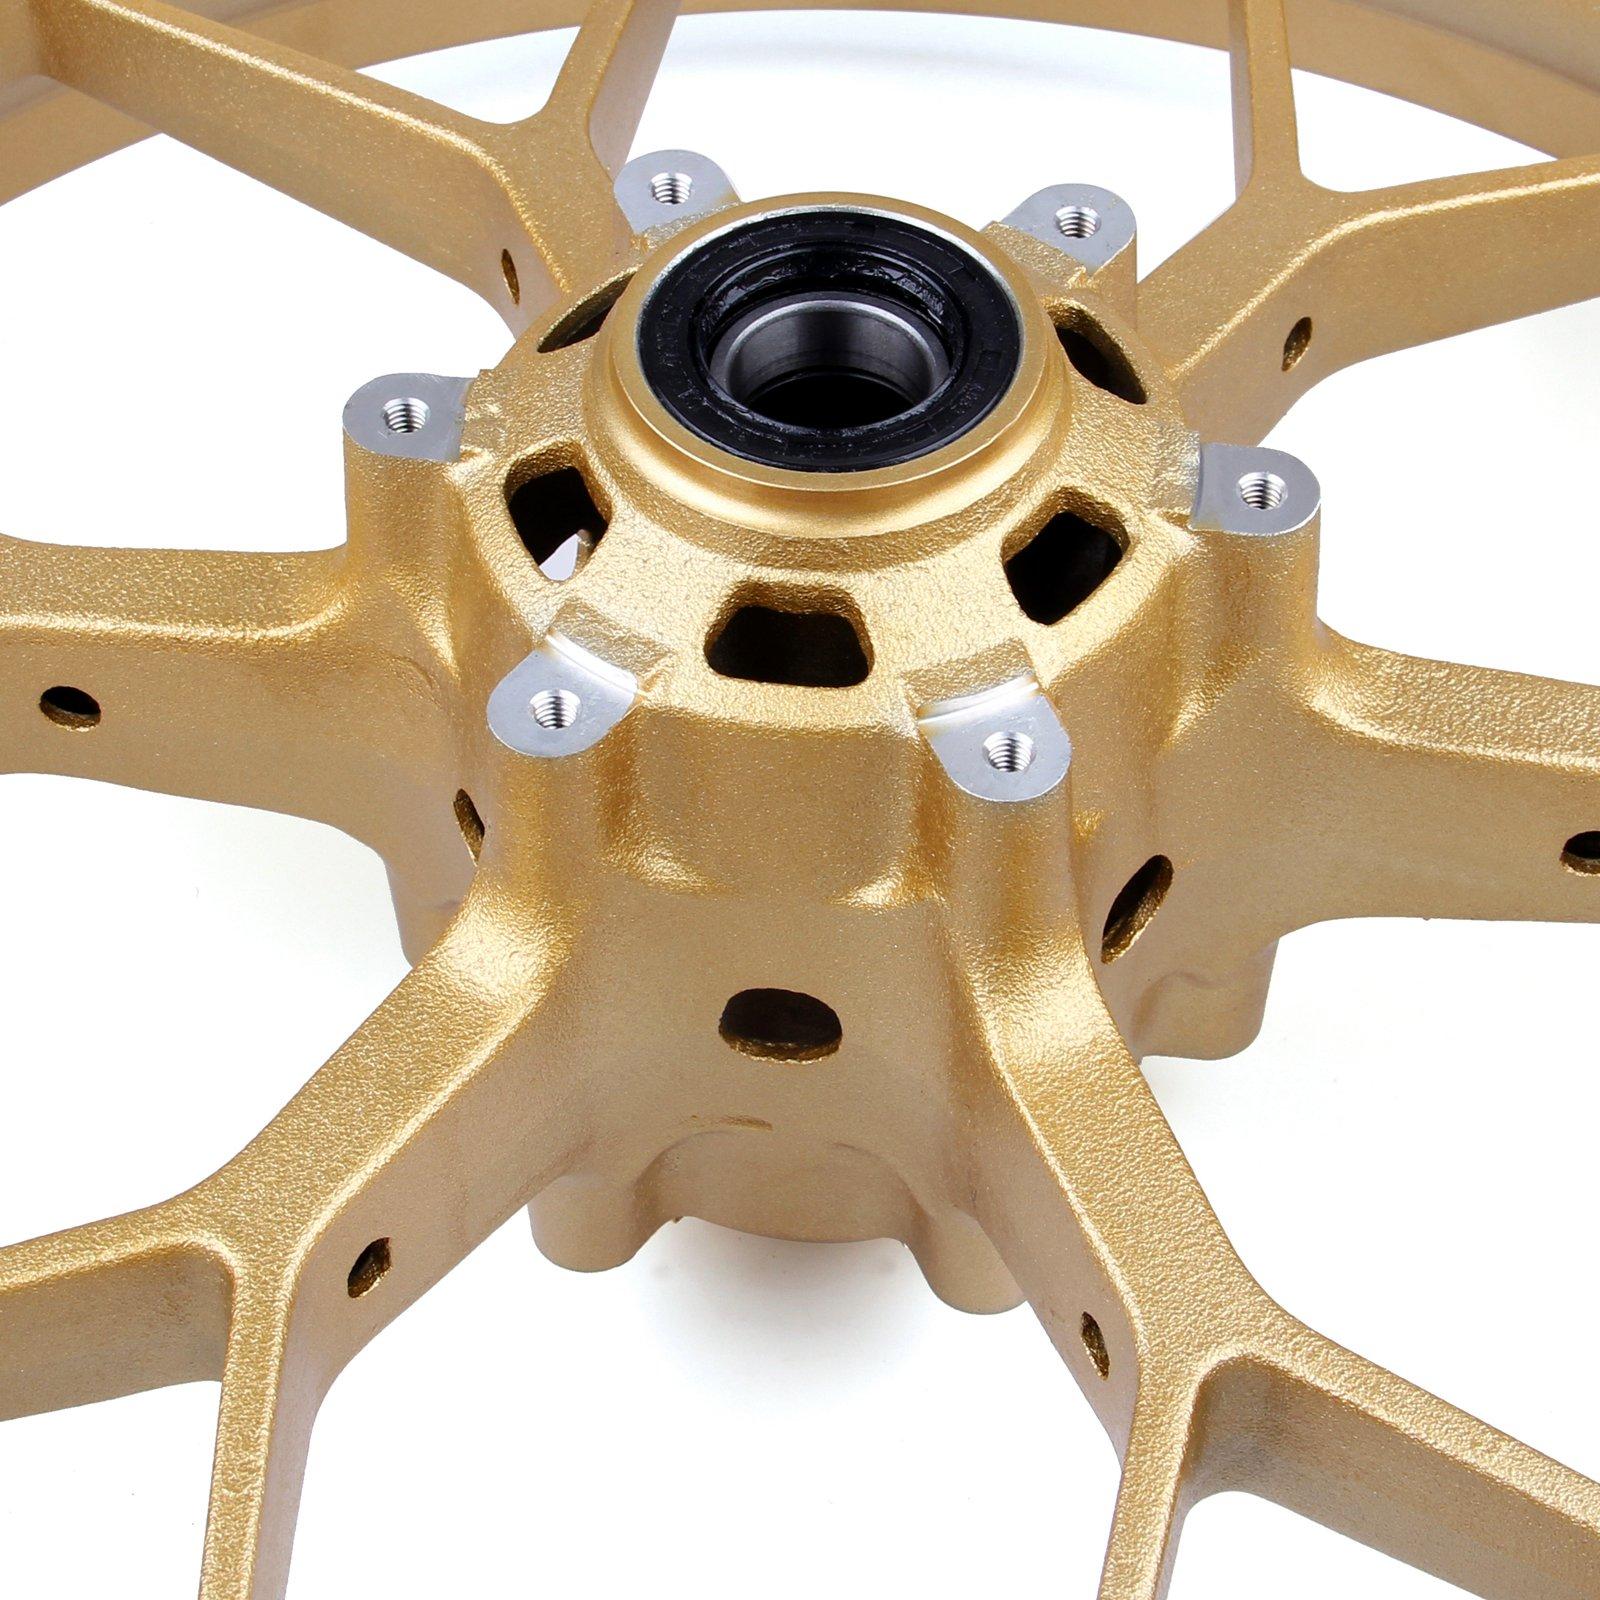 Areyourshop Front Wheel Rim For Honda CBR1000RR CBR 1000RR 2008-2014 Gold by Areyourshop (Image #3)